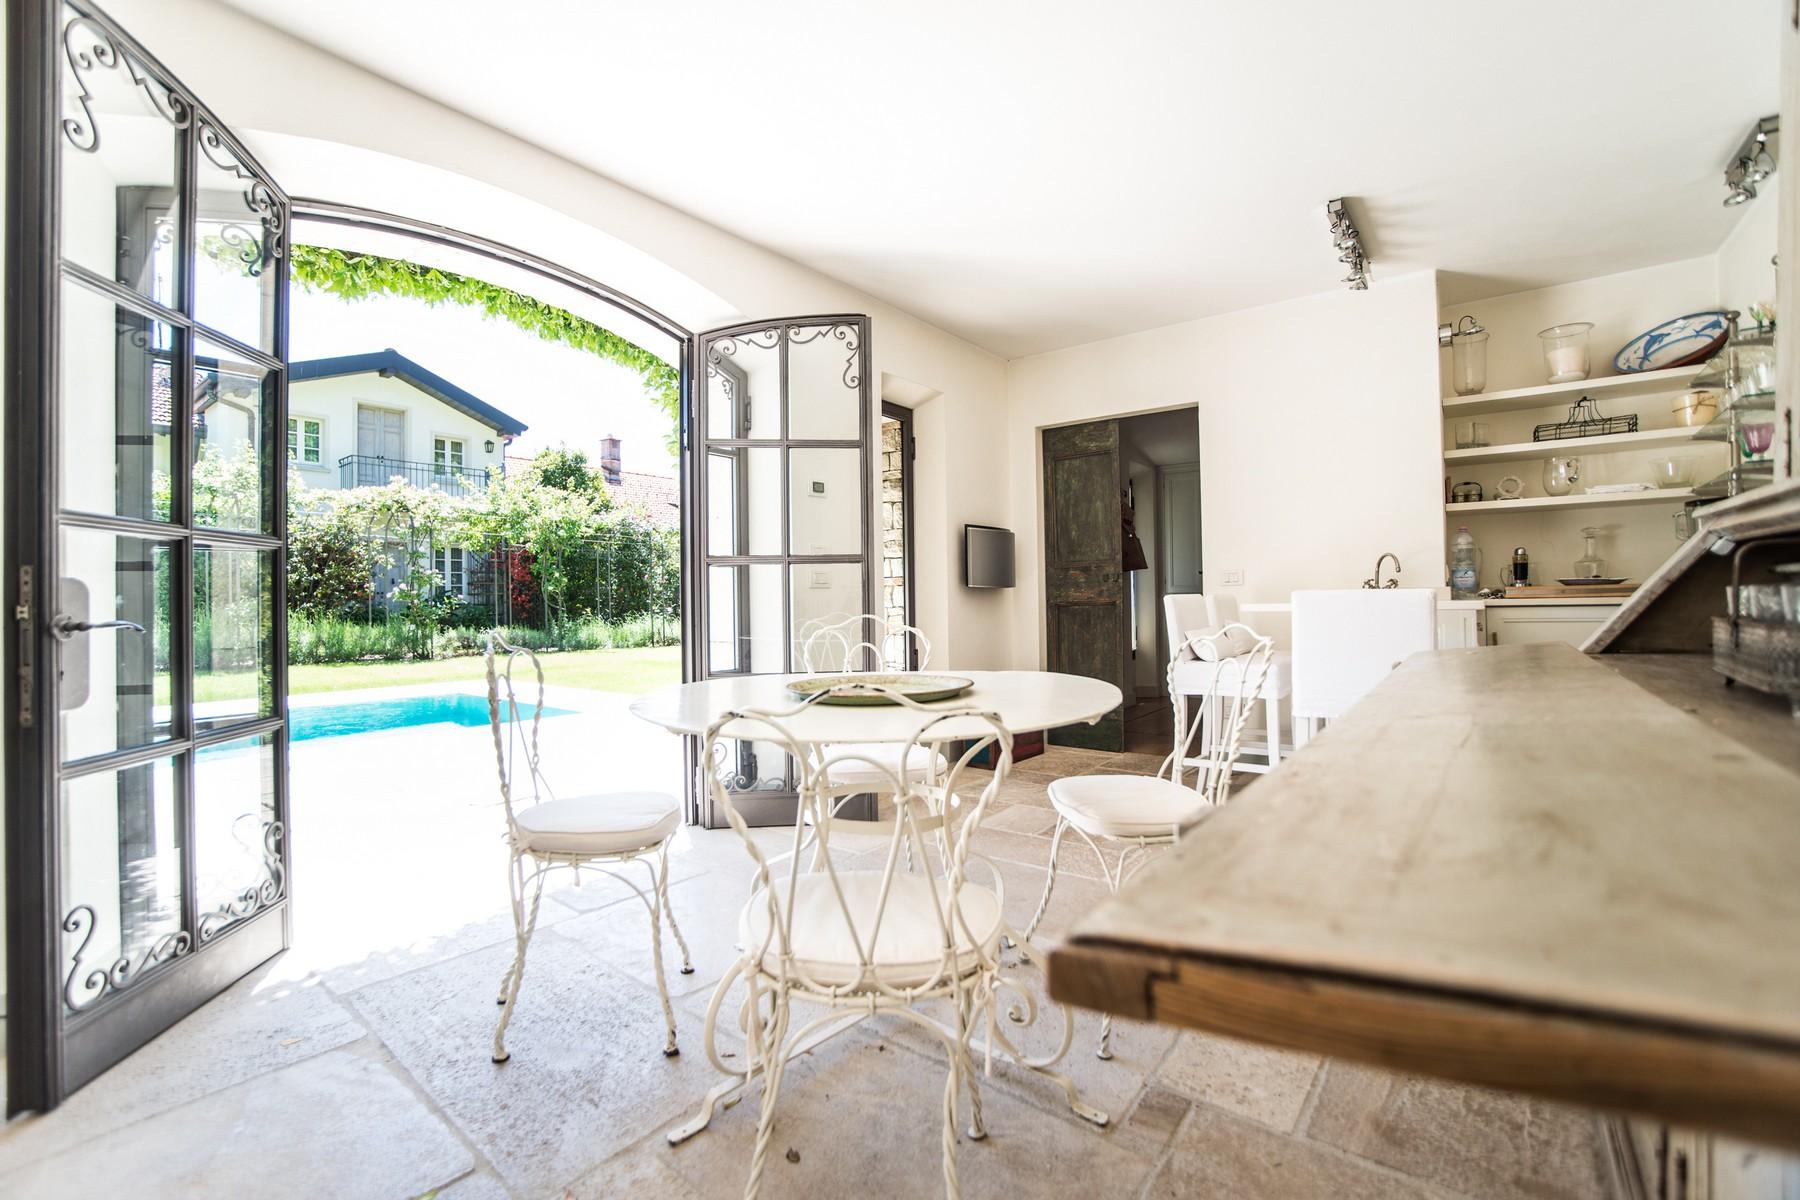 Additional photo for property listing at Gorgeous villa with dependance overlooking Lake Como Via Vittorio Veneto Cernobbio, Como 22012 Italien